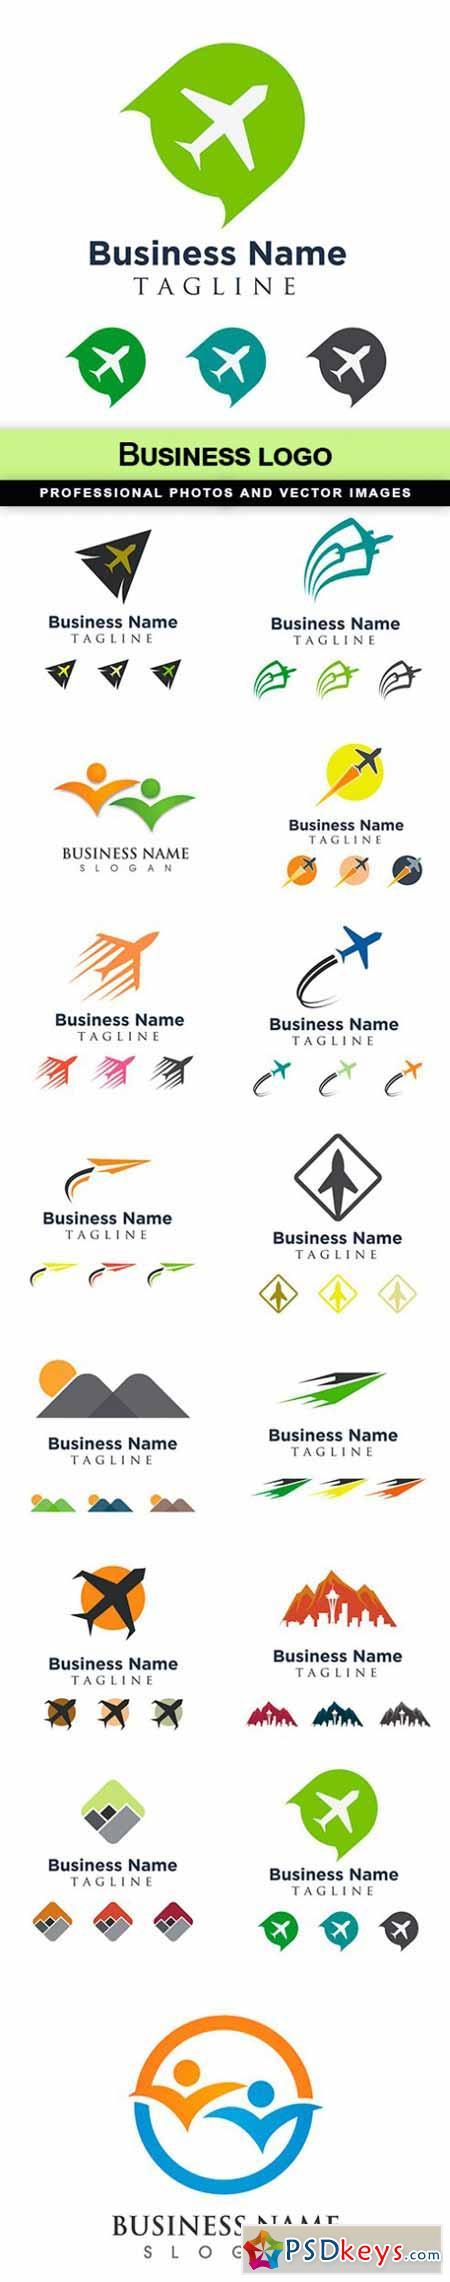 Business logo - 15 EPS